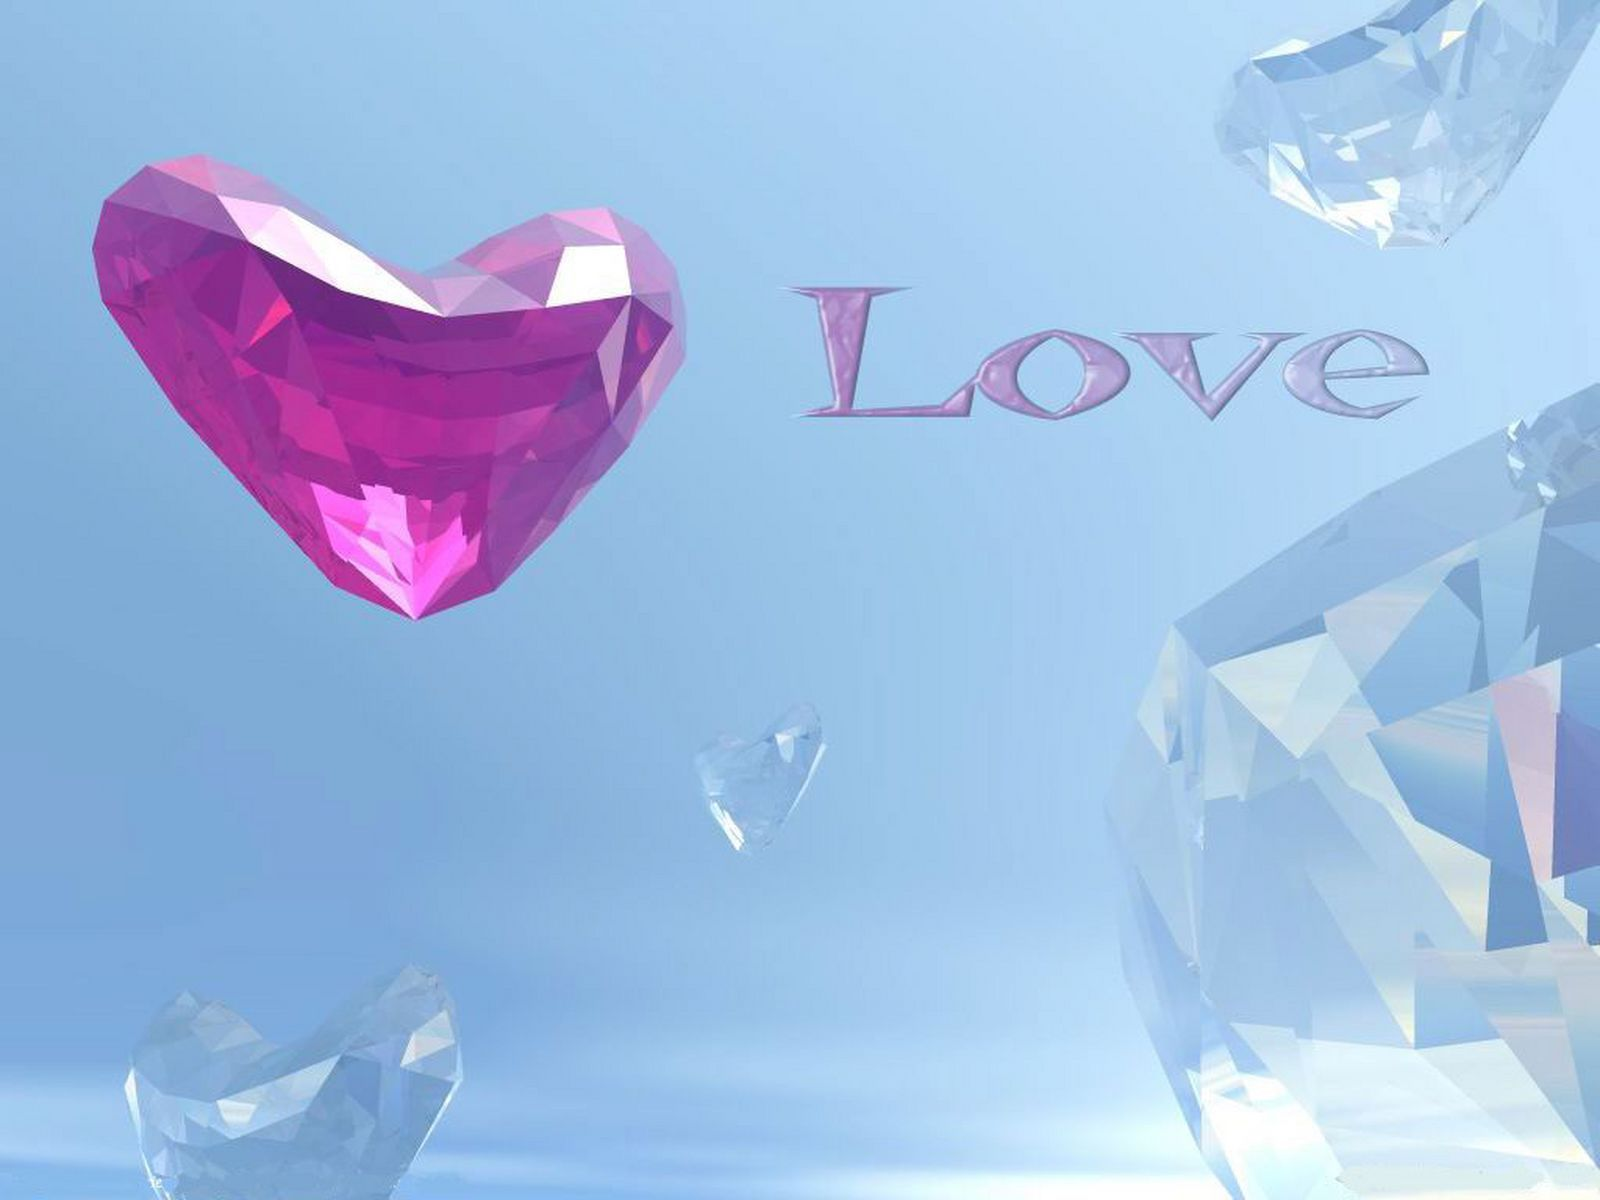 http://2.bp.blogspot.com/_5KxNTcXdreM/TCc13O5YUoI/AAAAAAAAA6U/3W6TCEvMs9A/s1600/Love-Wallpaper-love-2939260-1600-1200.jpg